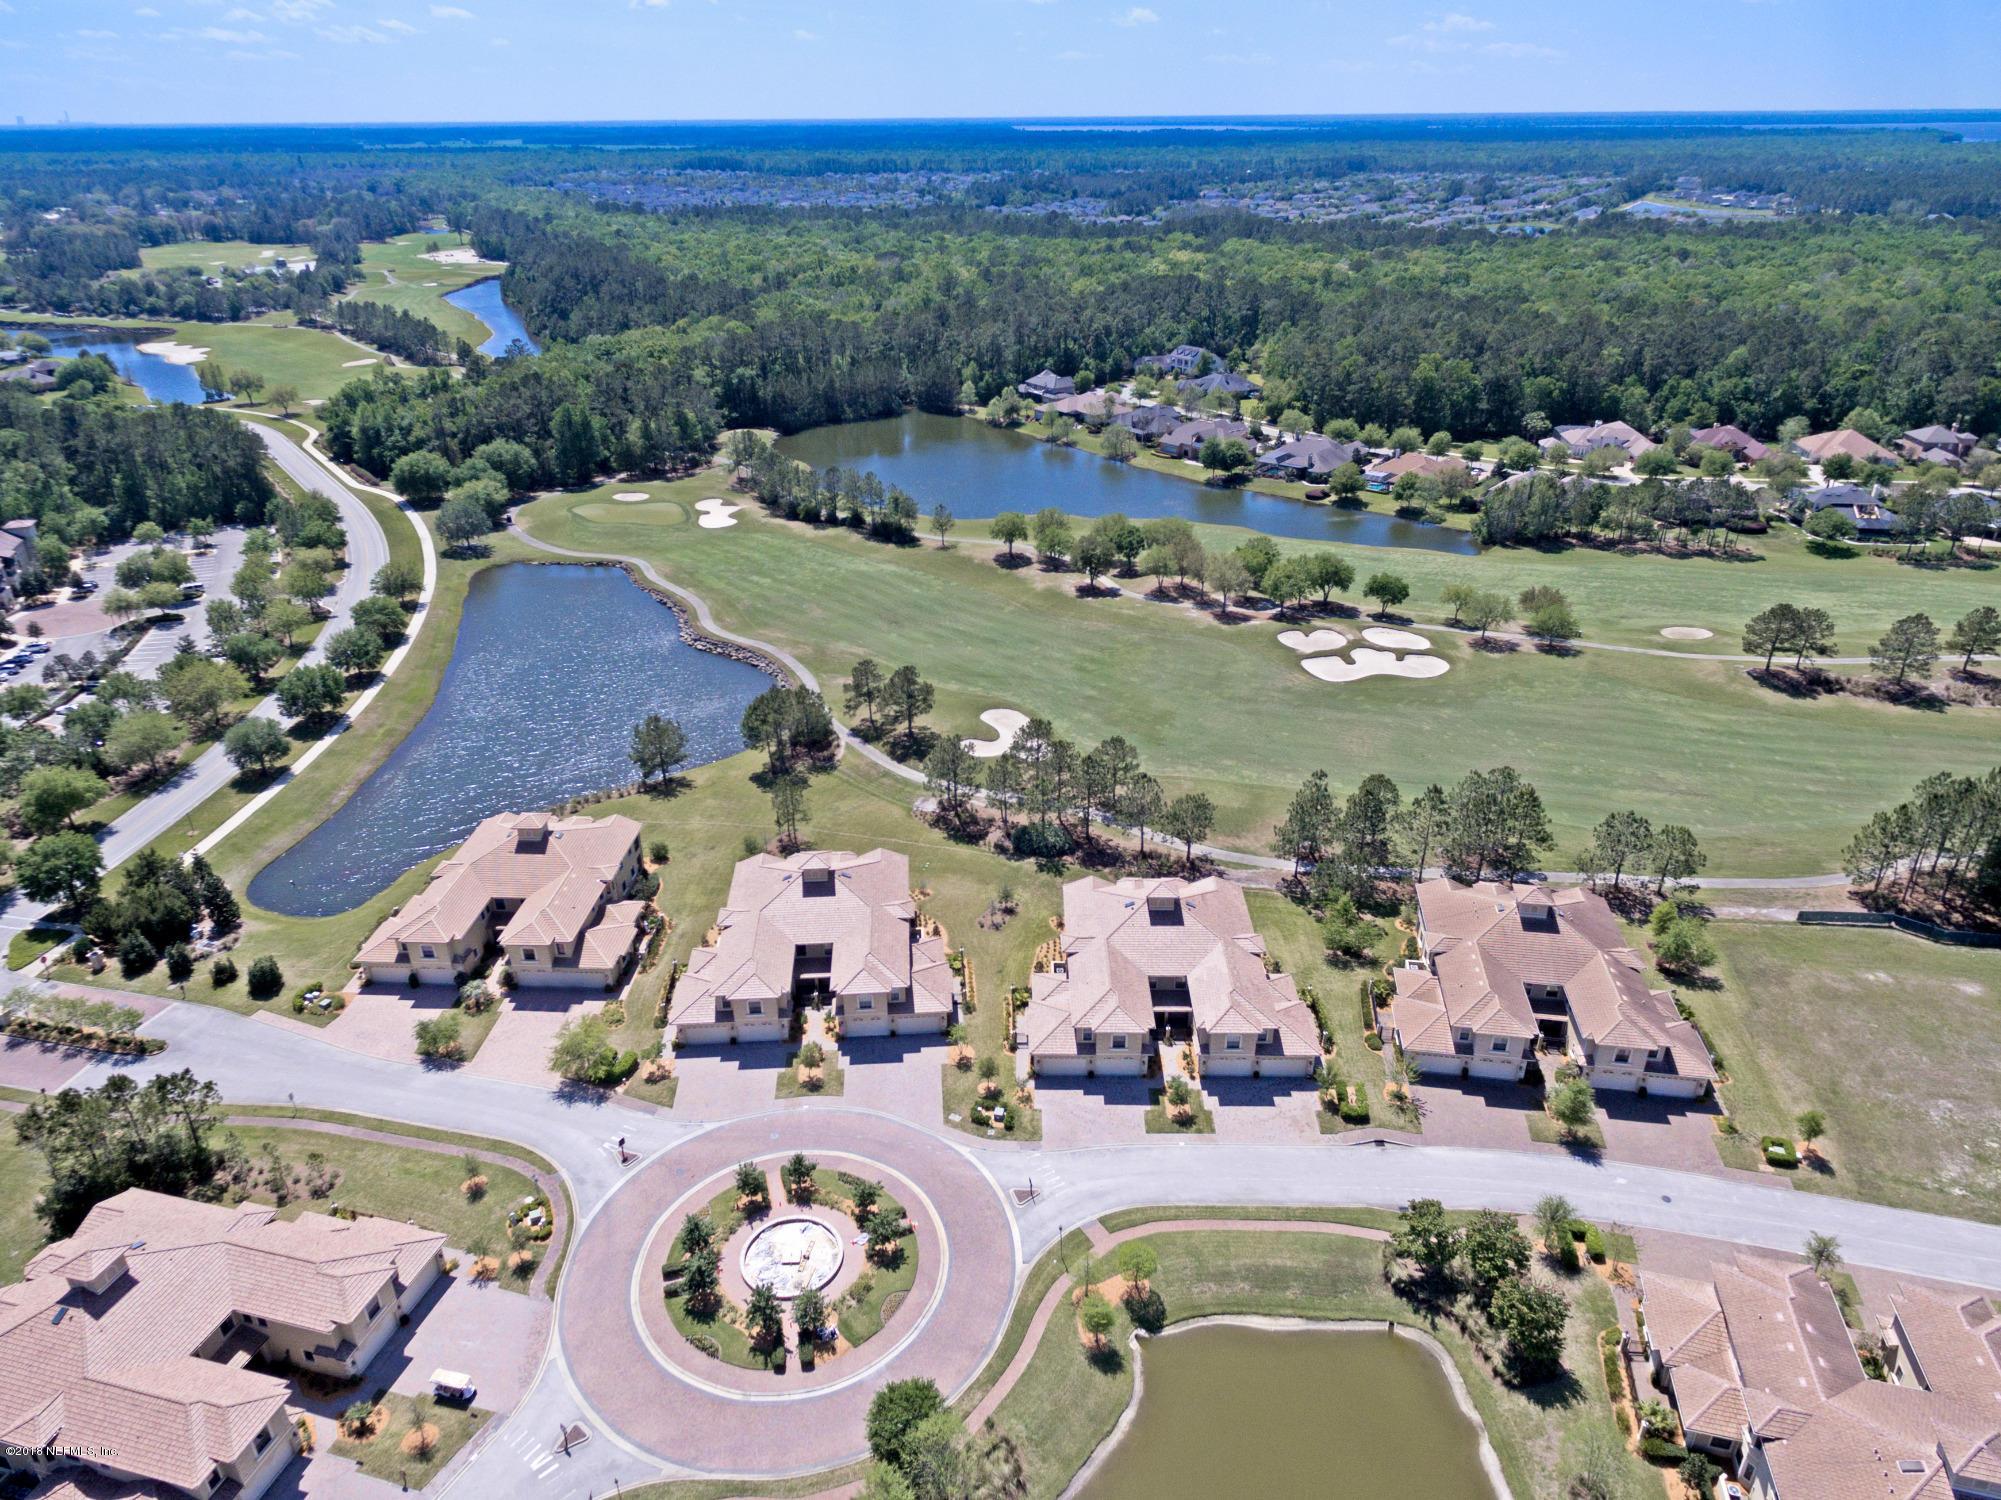 165 LATERRA LINKS, ST AUGUSTINE, FLORIDA 32092, 3 Bedrooms Bedrooms, ,3 BathroomsBathrooms,Condo,For sale,LATERRA LINKS,927782